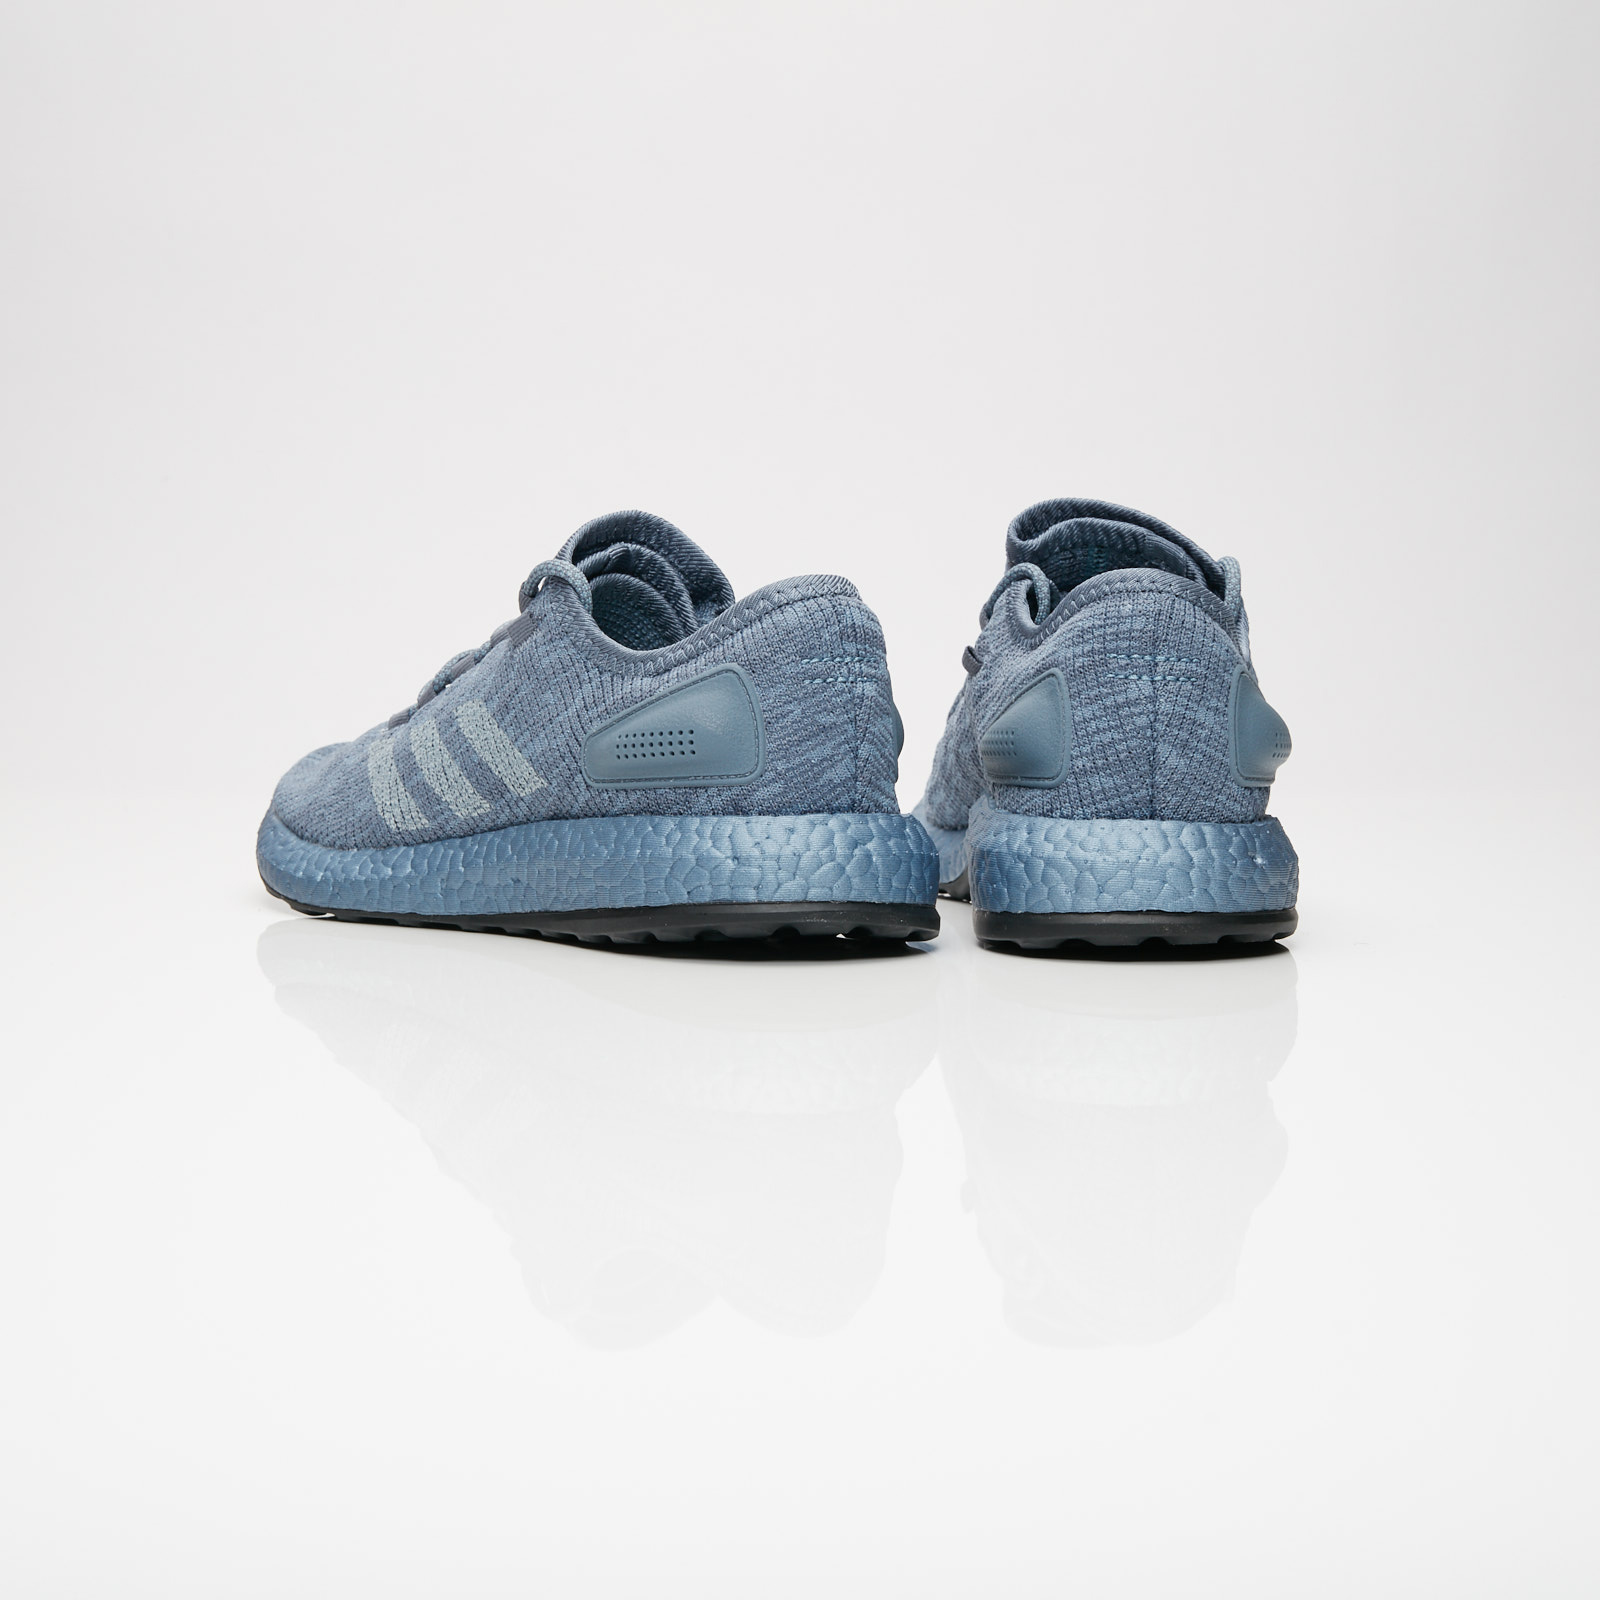 4b61be06b adidas Pureboost - Cm8303 - Sneakersnstuff